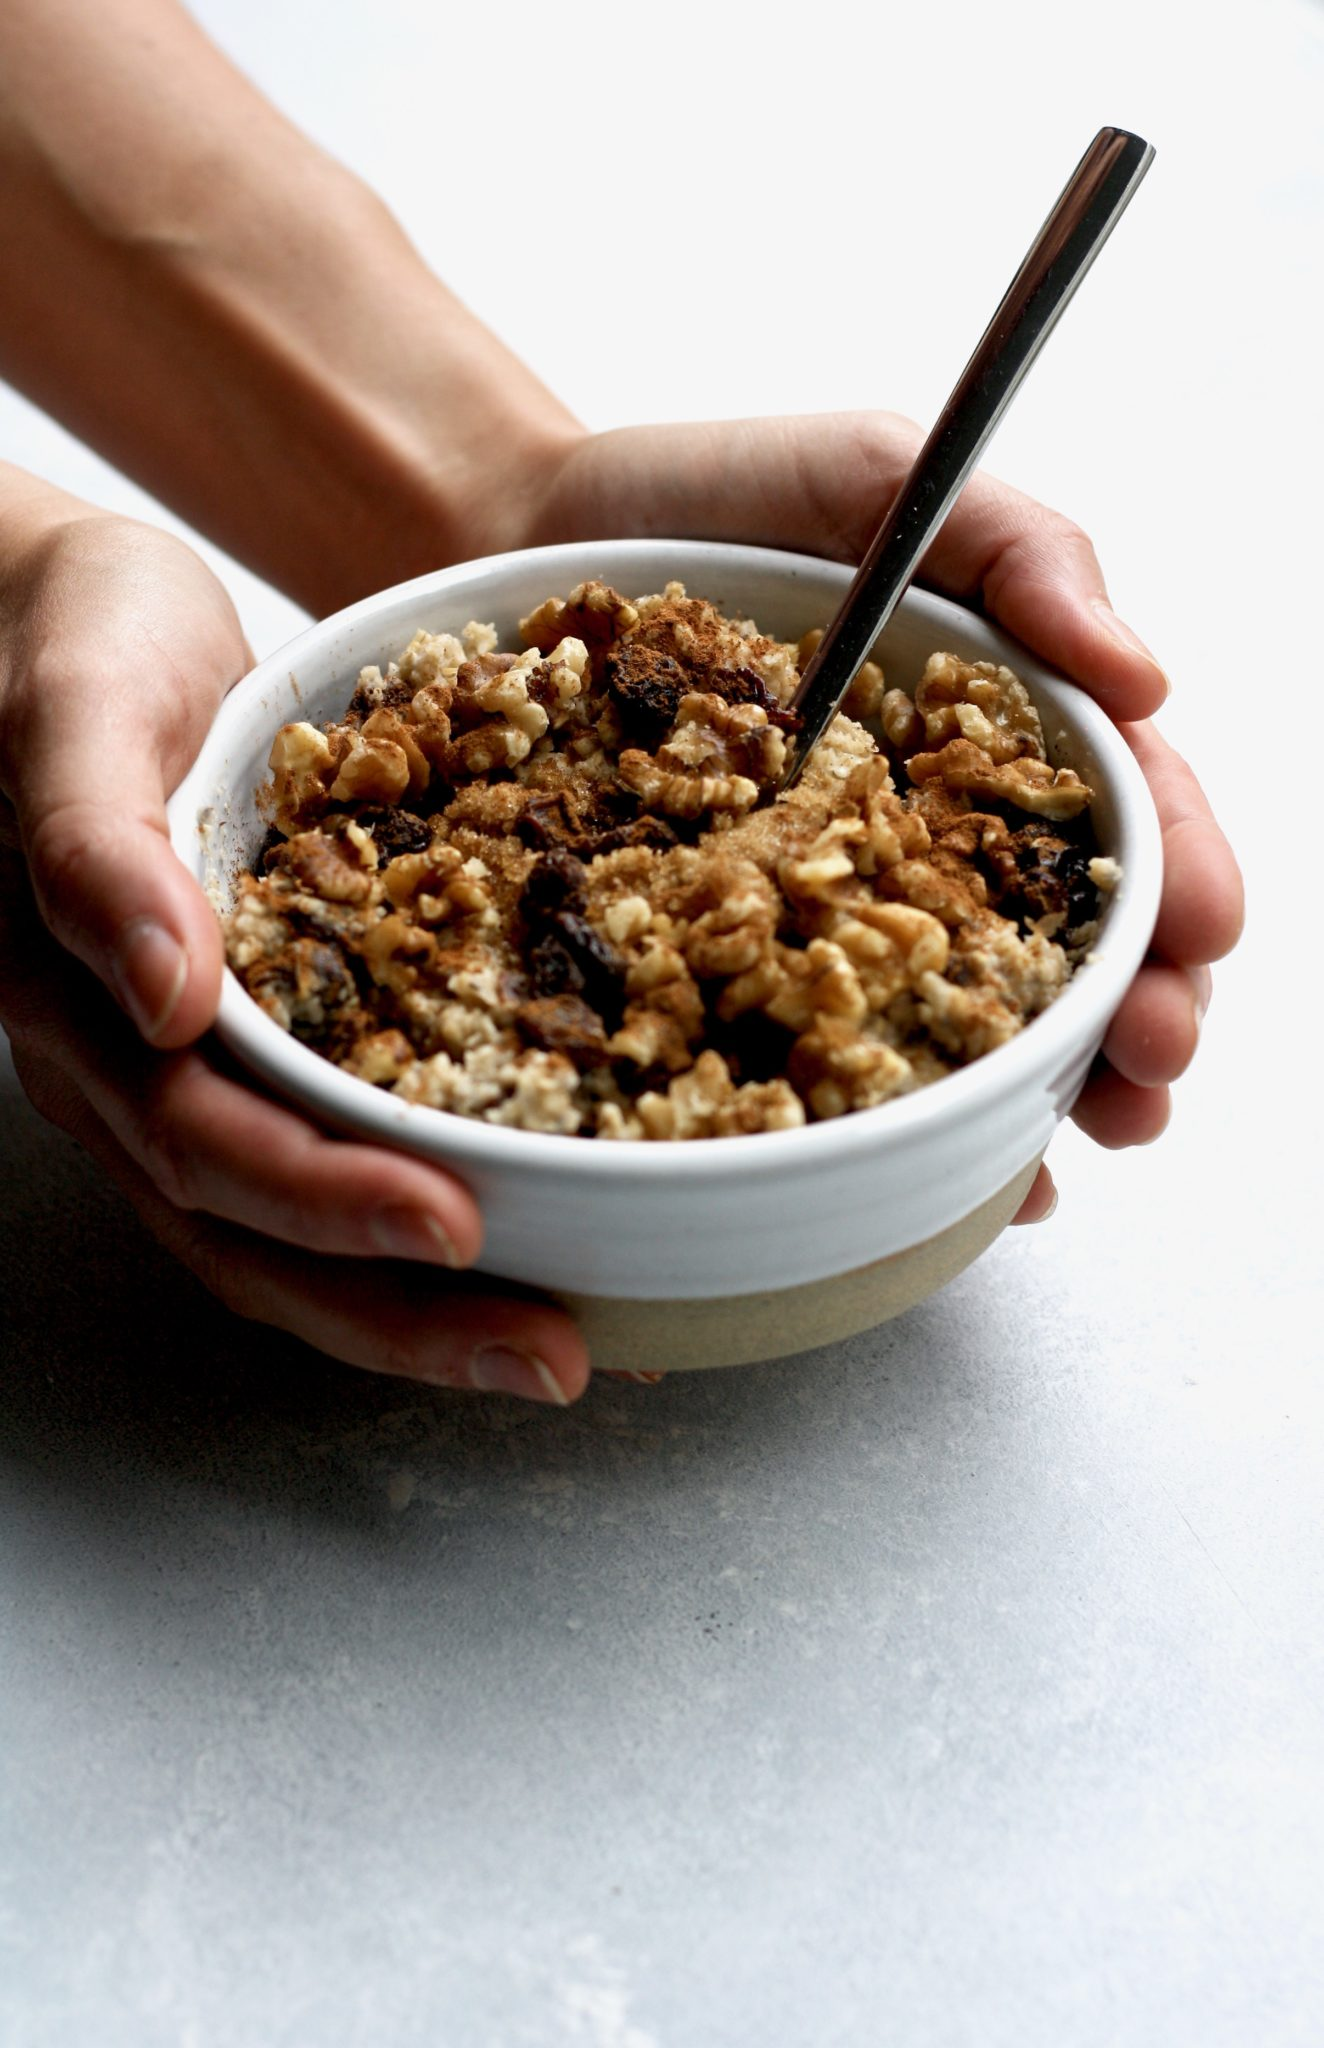 cinnamon raisin walnut oatmeal // cait's plate